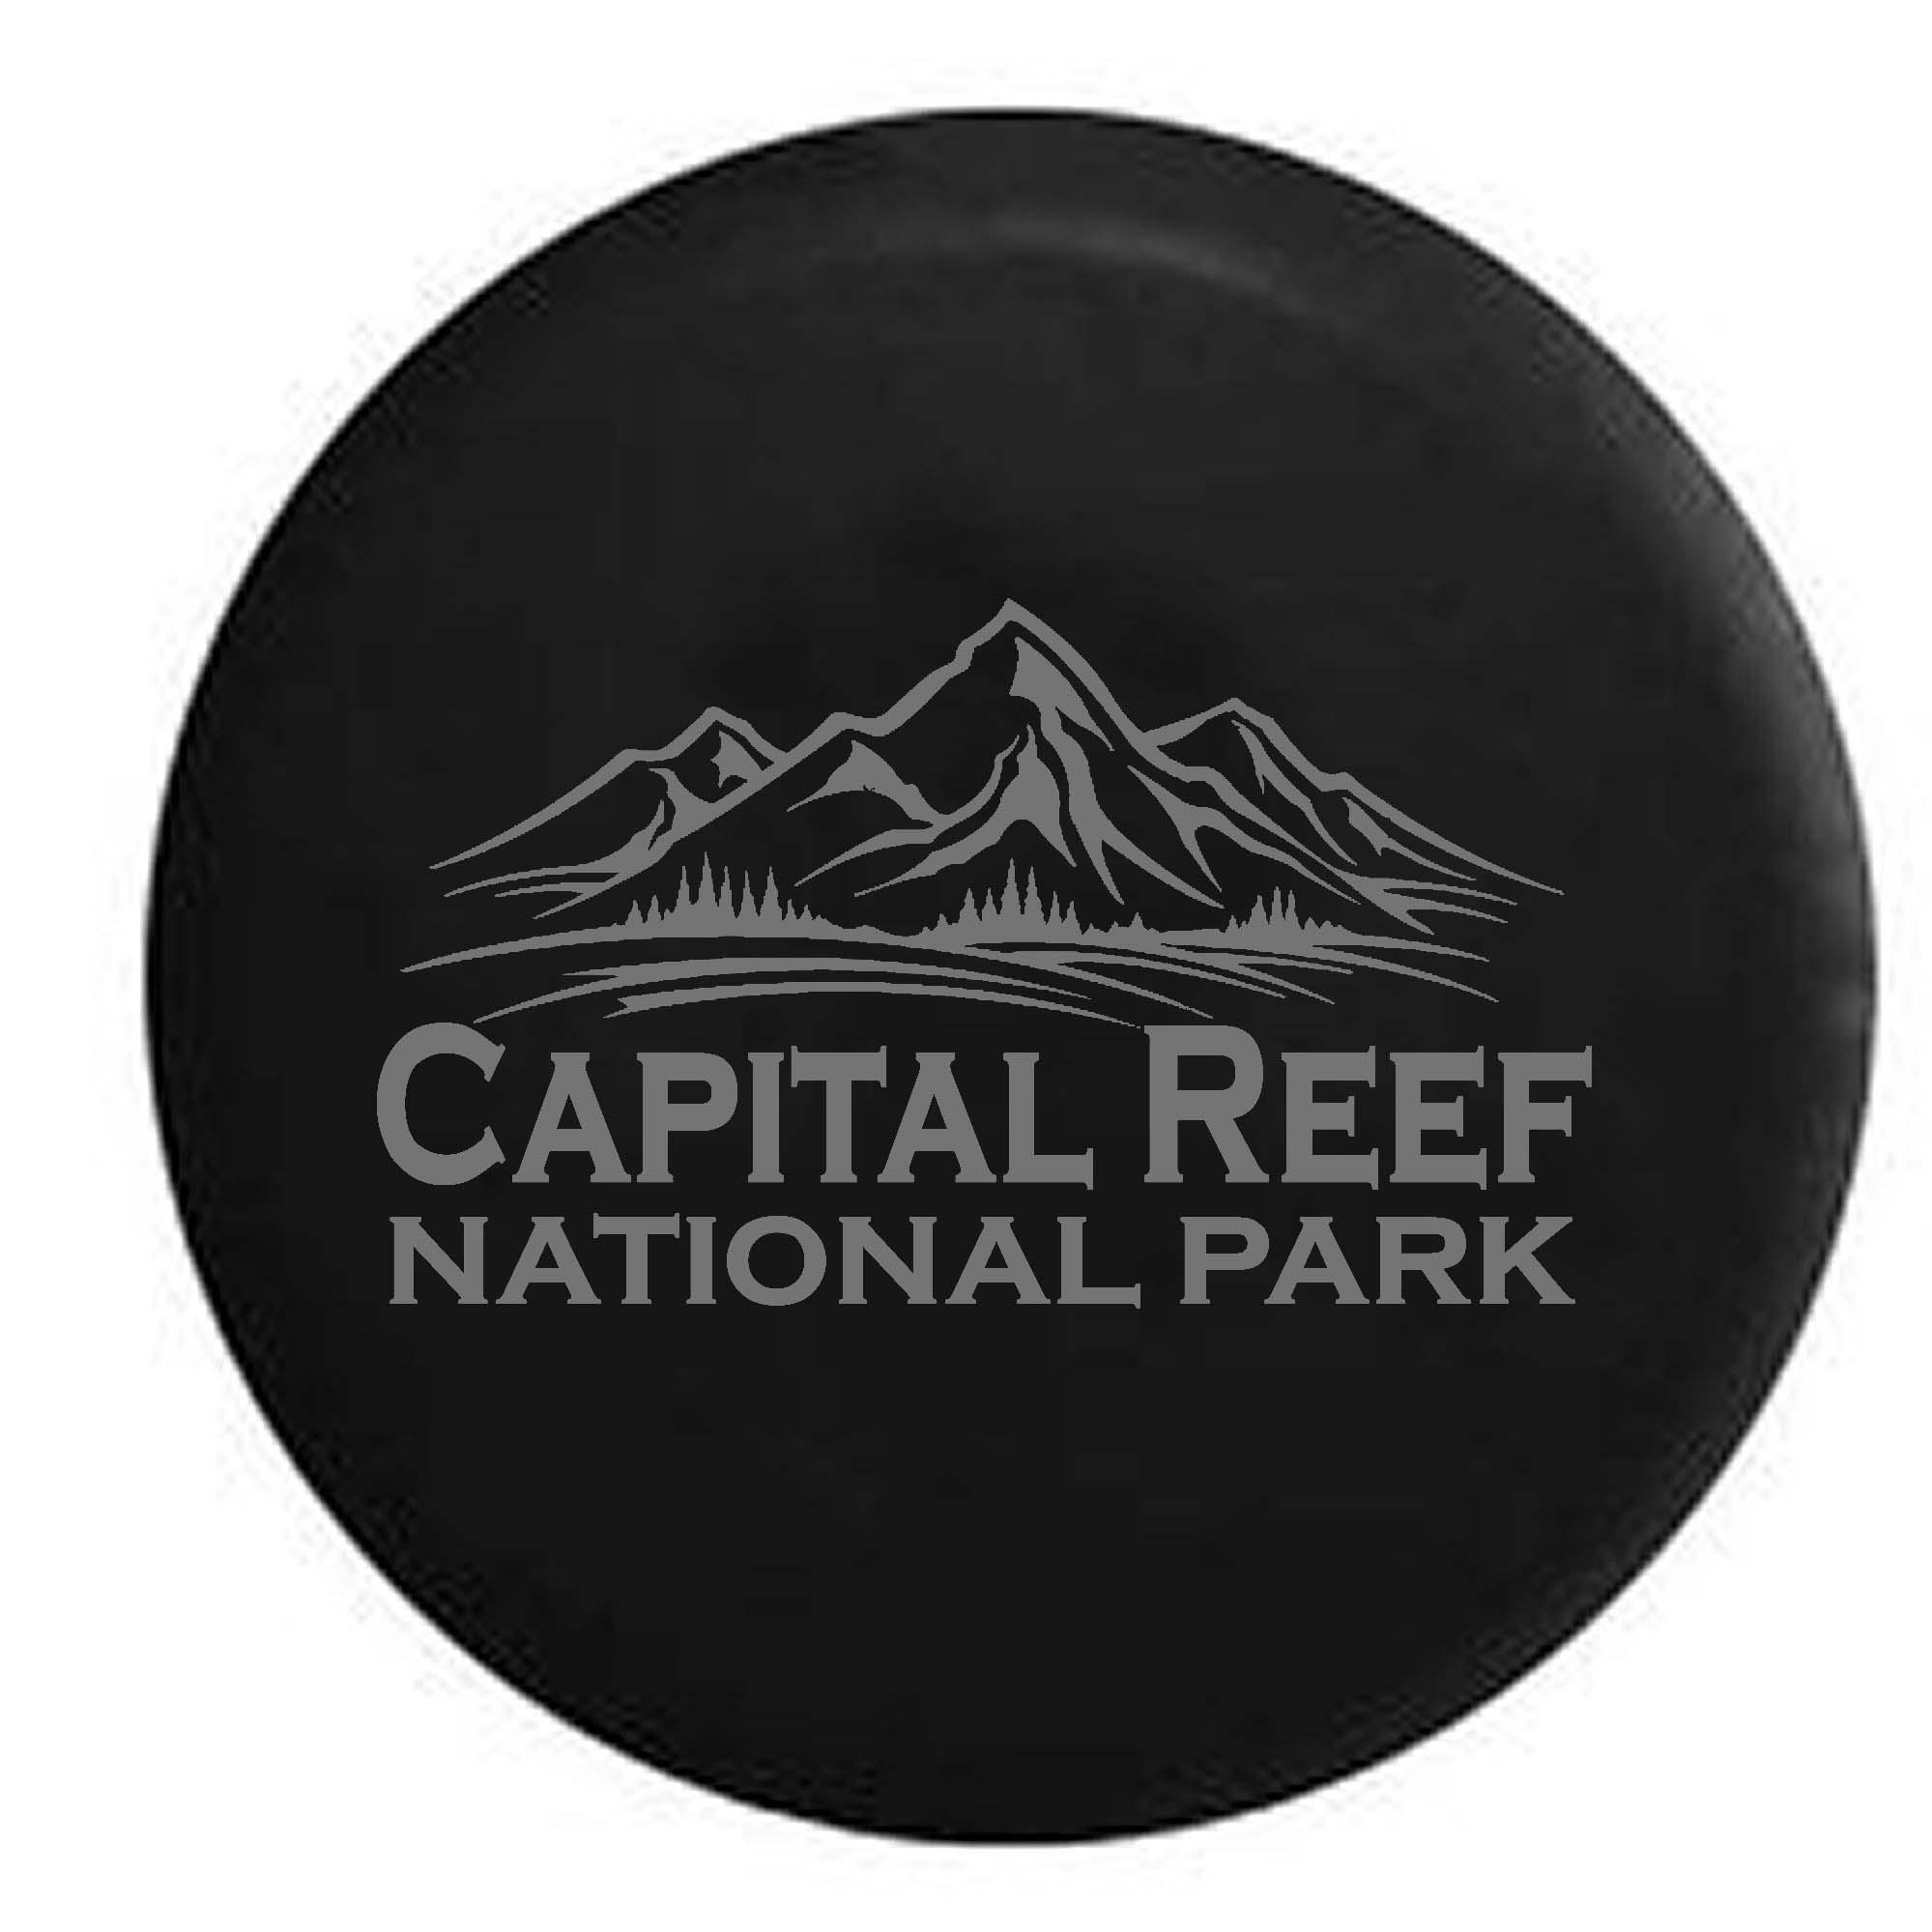 Capital Reef National Park Utah Trailer RV Spare Tire Cov...